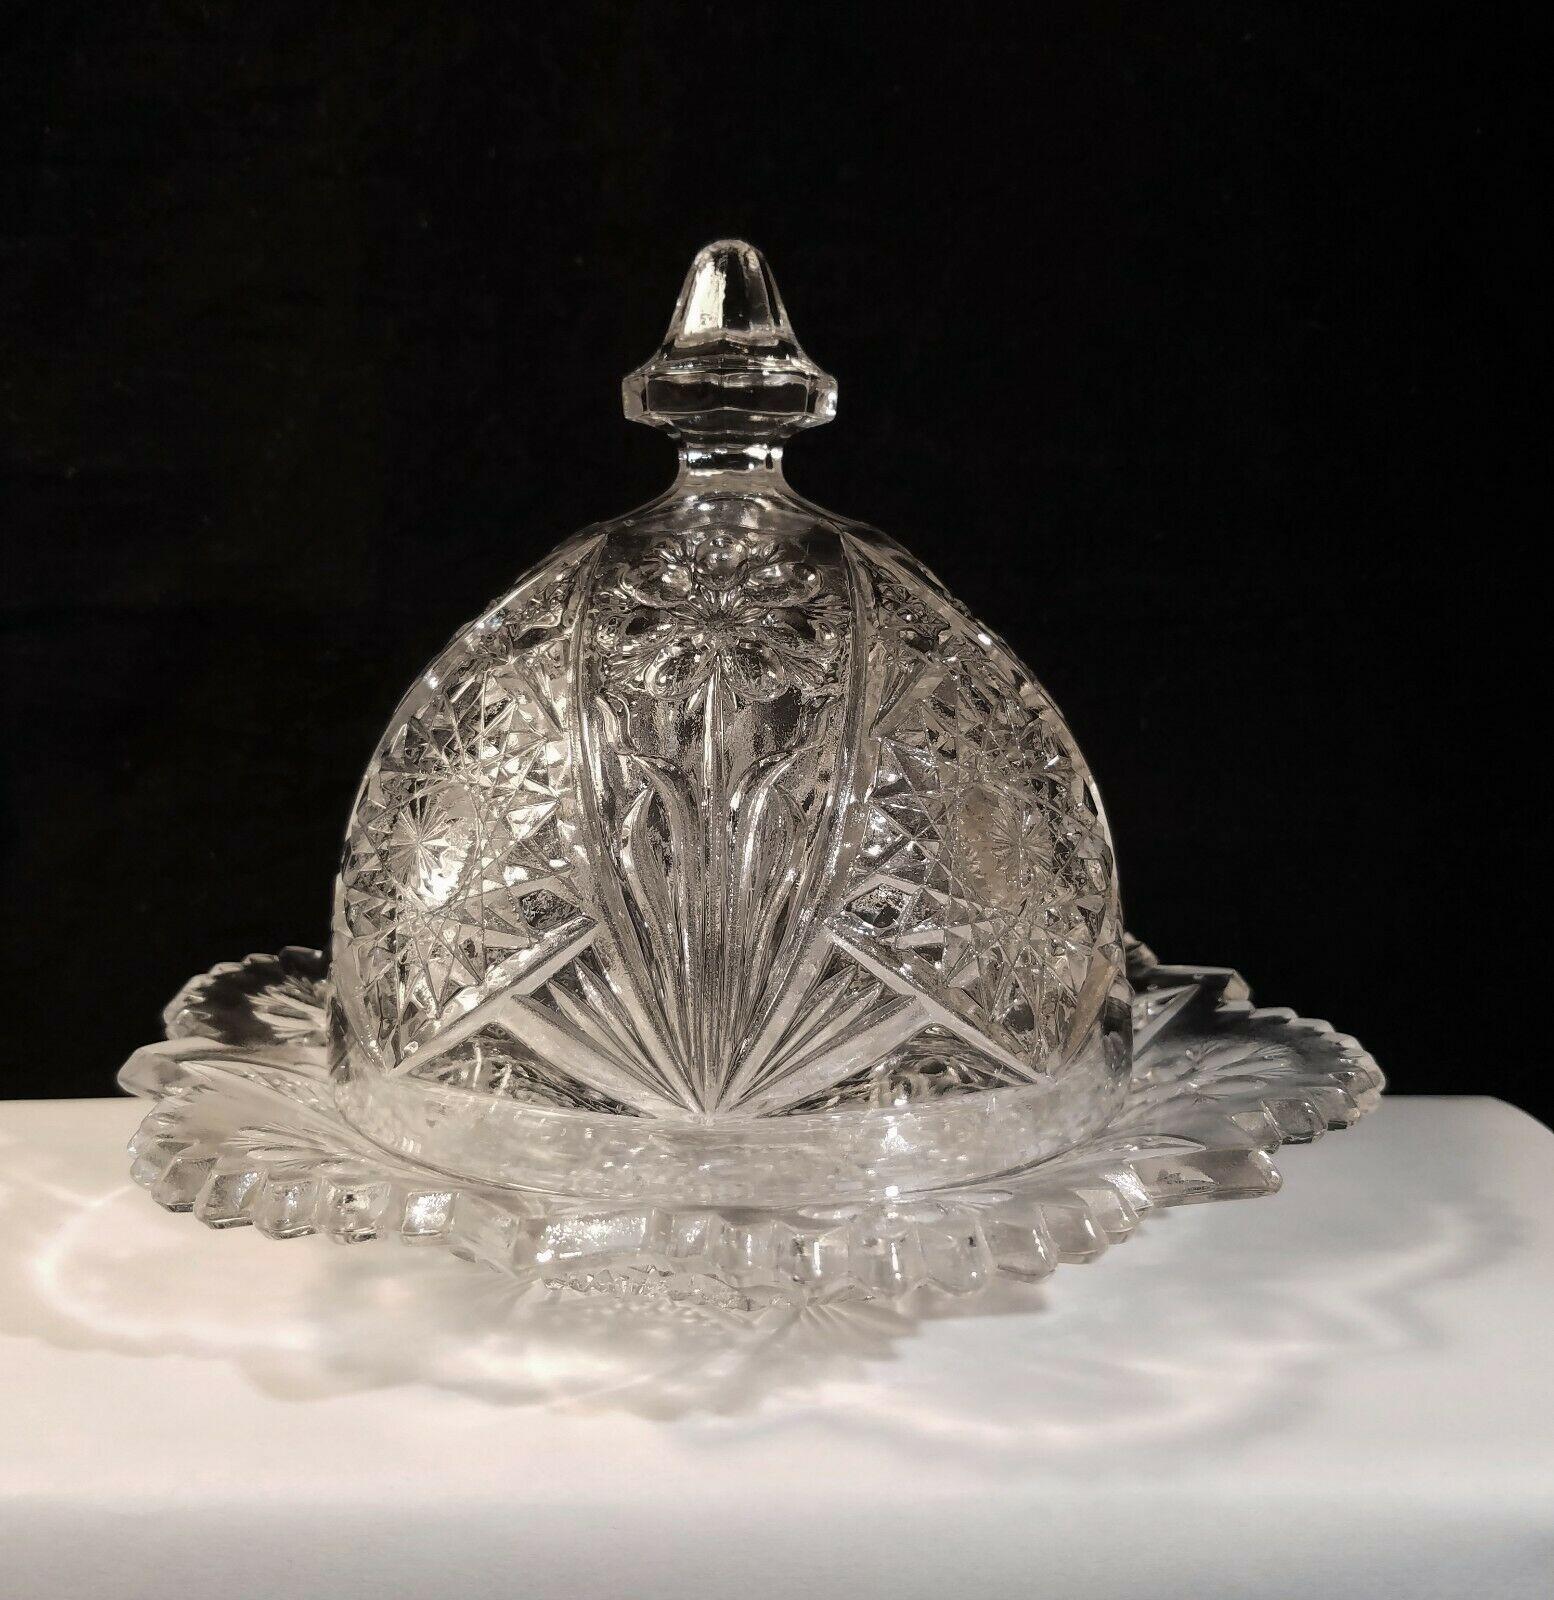 La Rochelle Domed Butter Dish Imperial 474 Fringe Flower Serrated Rim c1911 - $22.95